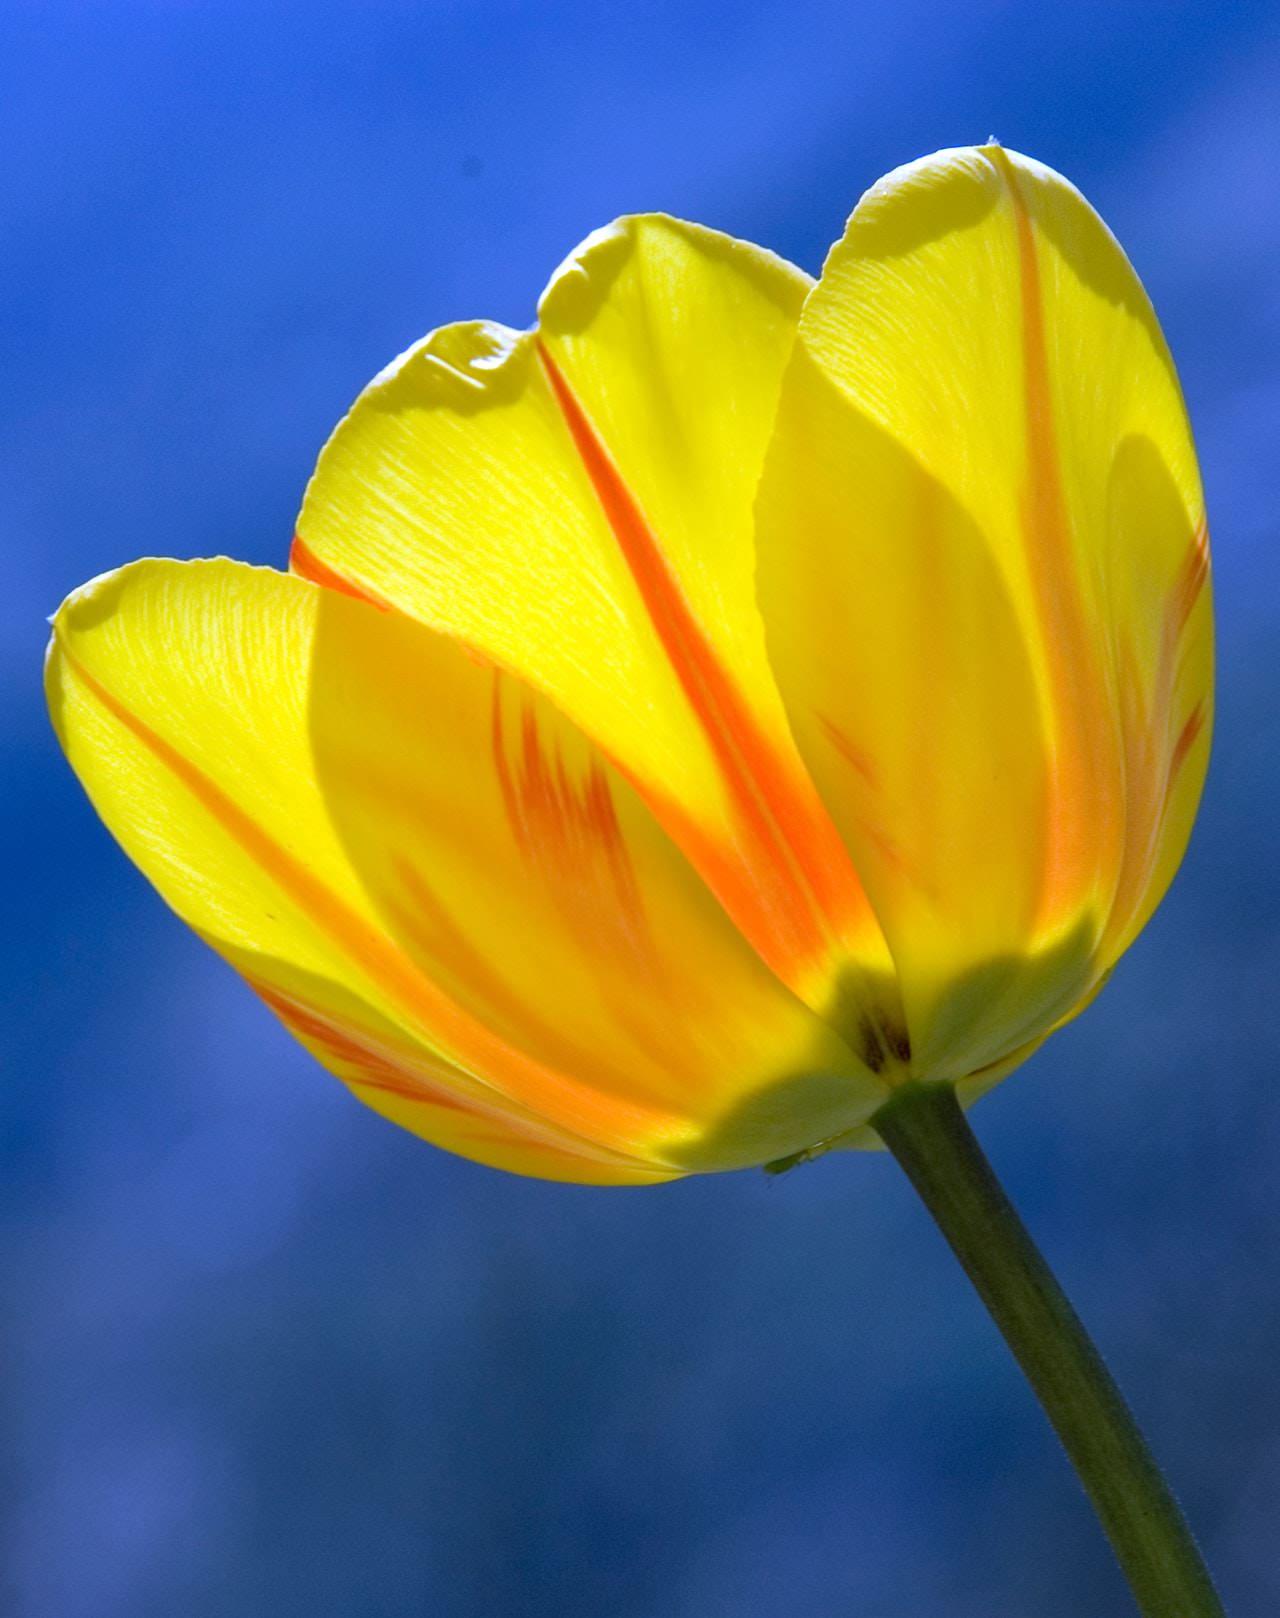 tulip-yellow-spring-flowers-60115.jpeg